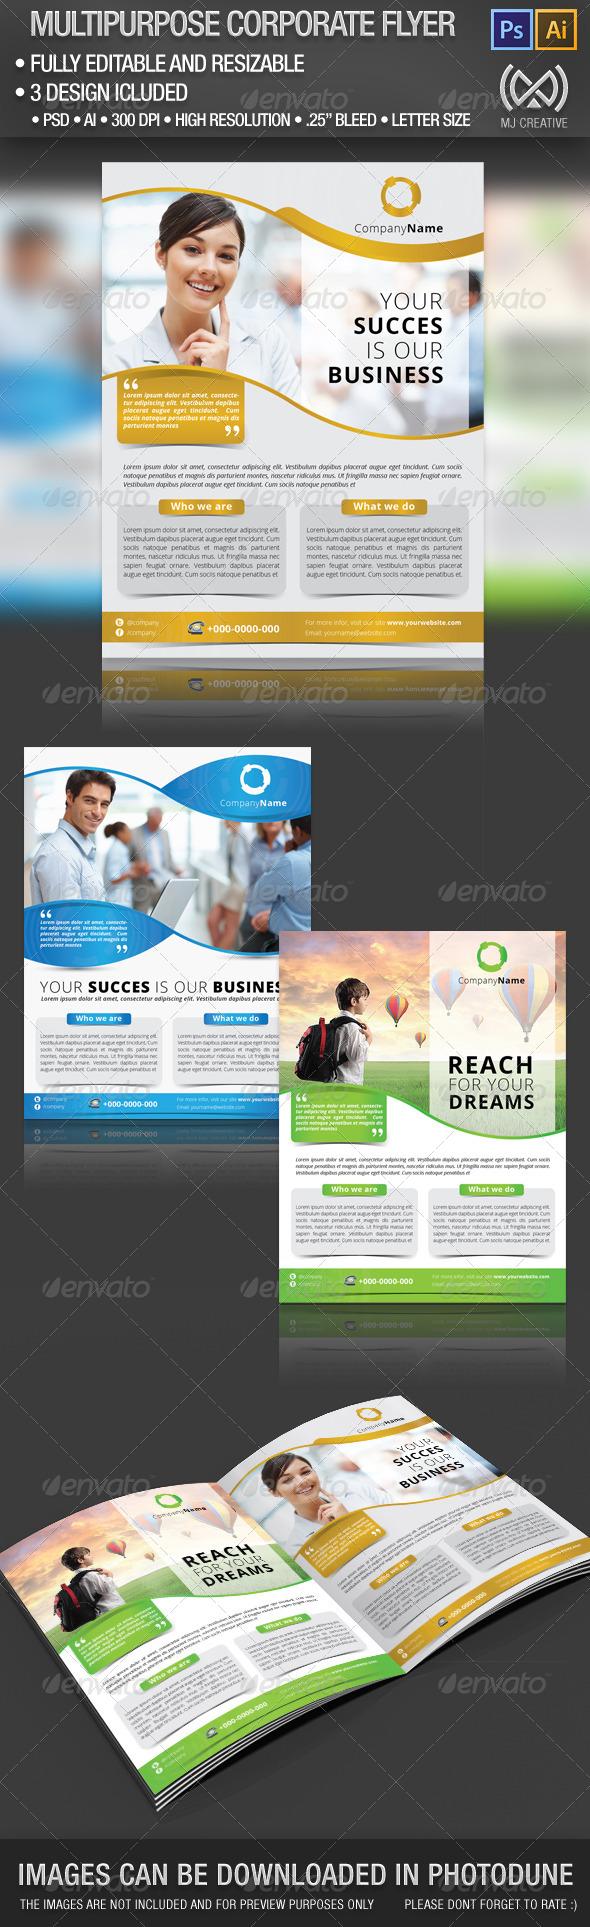 GraphicRiver Multipurpose Corporate Flyer Poster 4731306